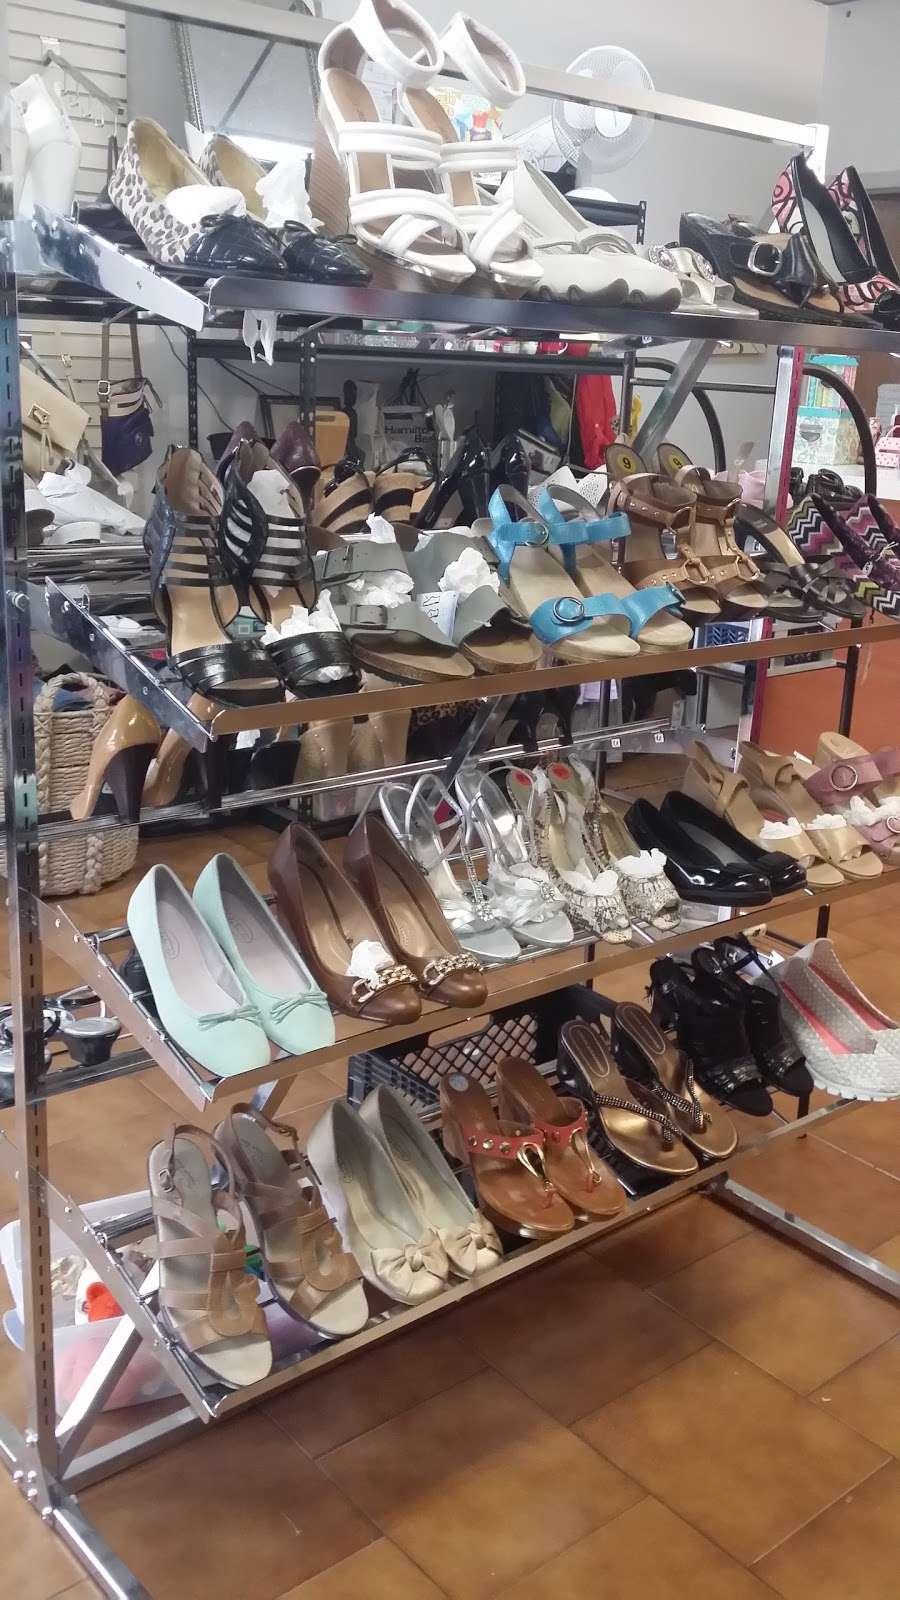 Glow Thrift Shop Store - clothing store  | Photo 4 of 10 | Address: 561 Palisade Ave, Jersey City, NJ 07307, USA | Phone: (646) 399-7397